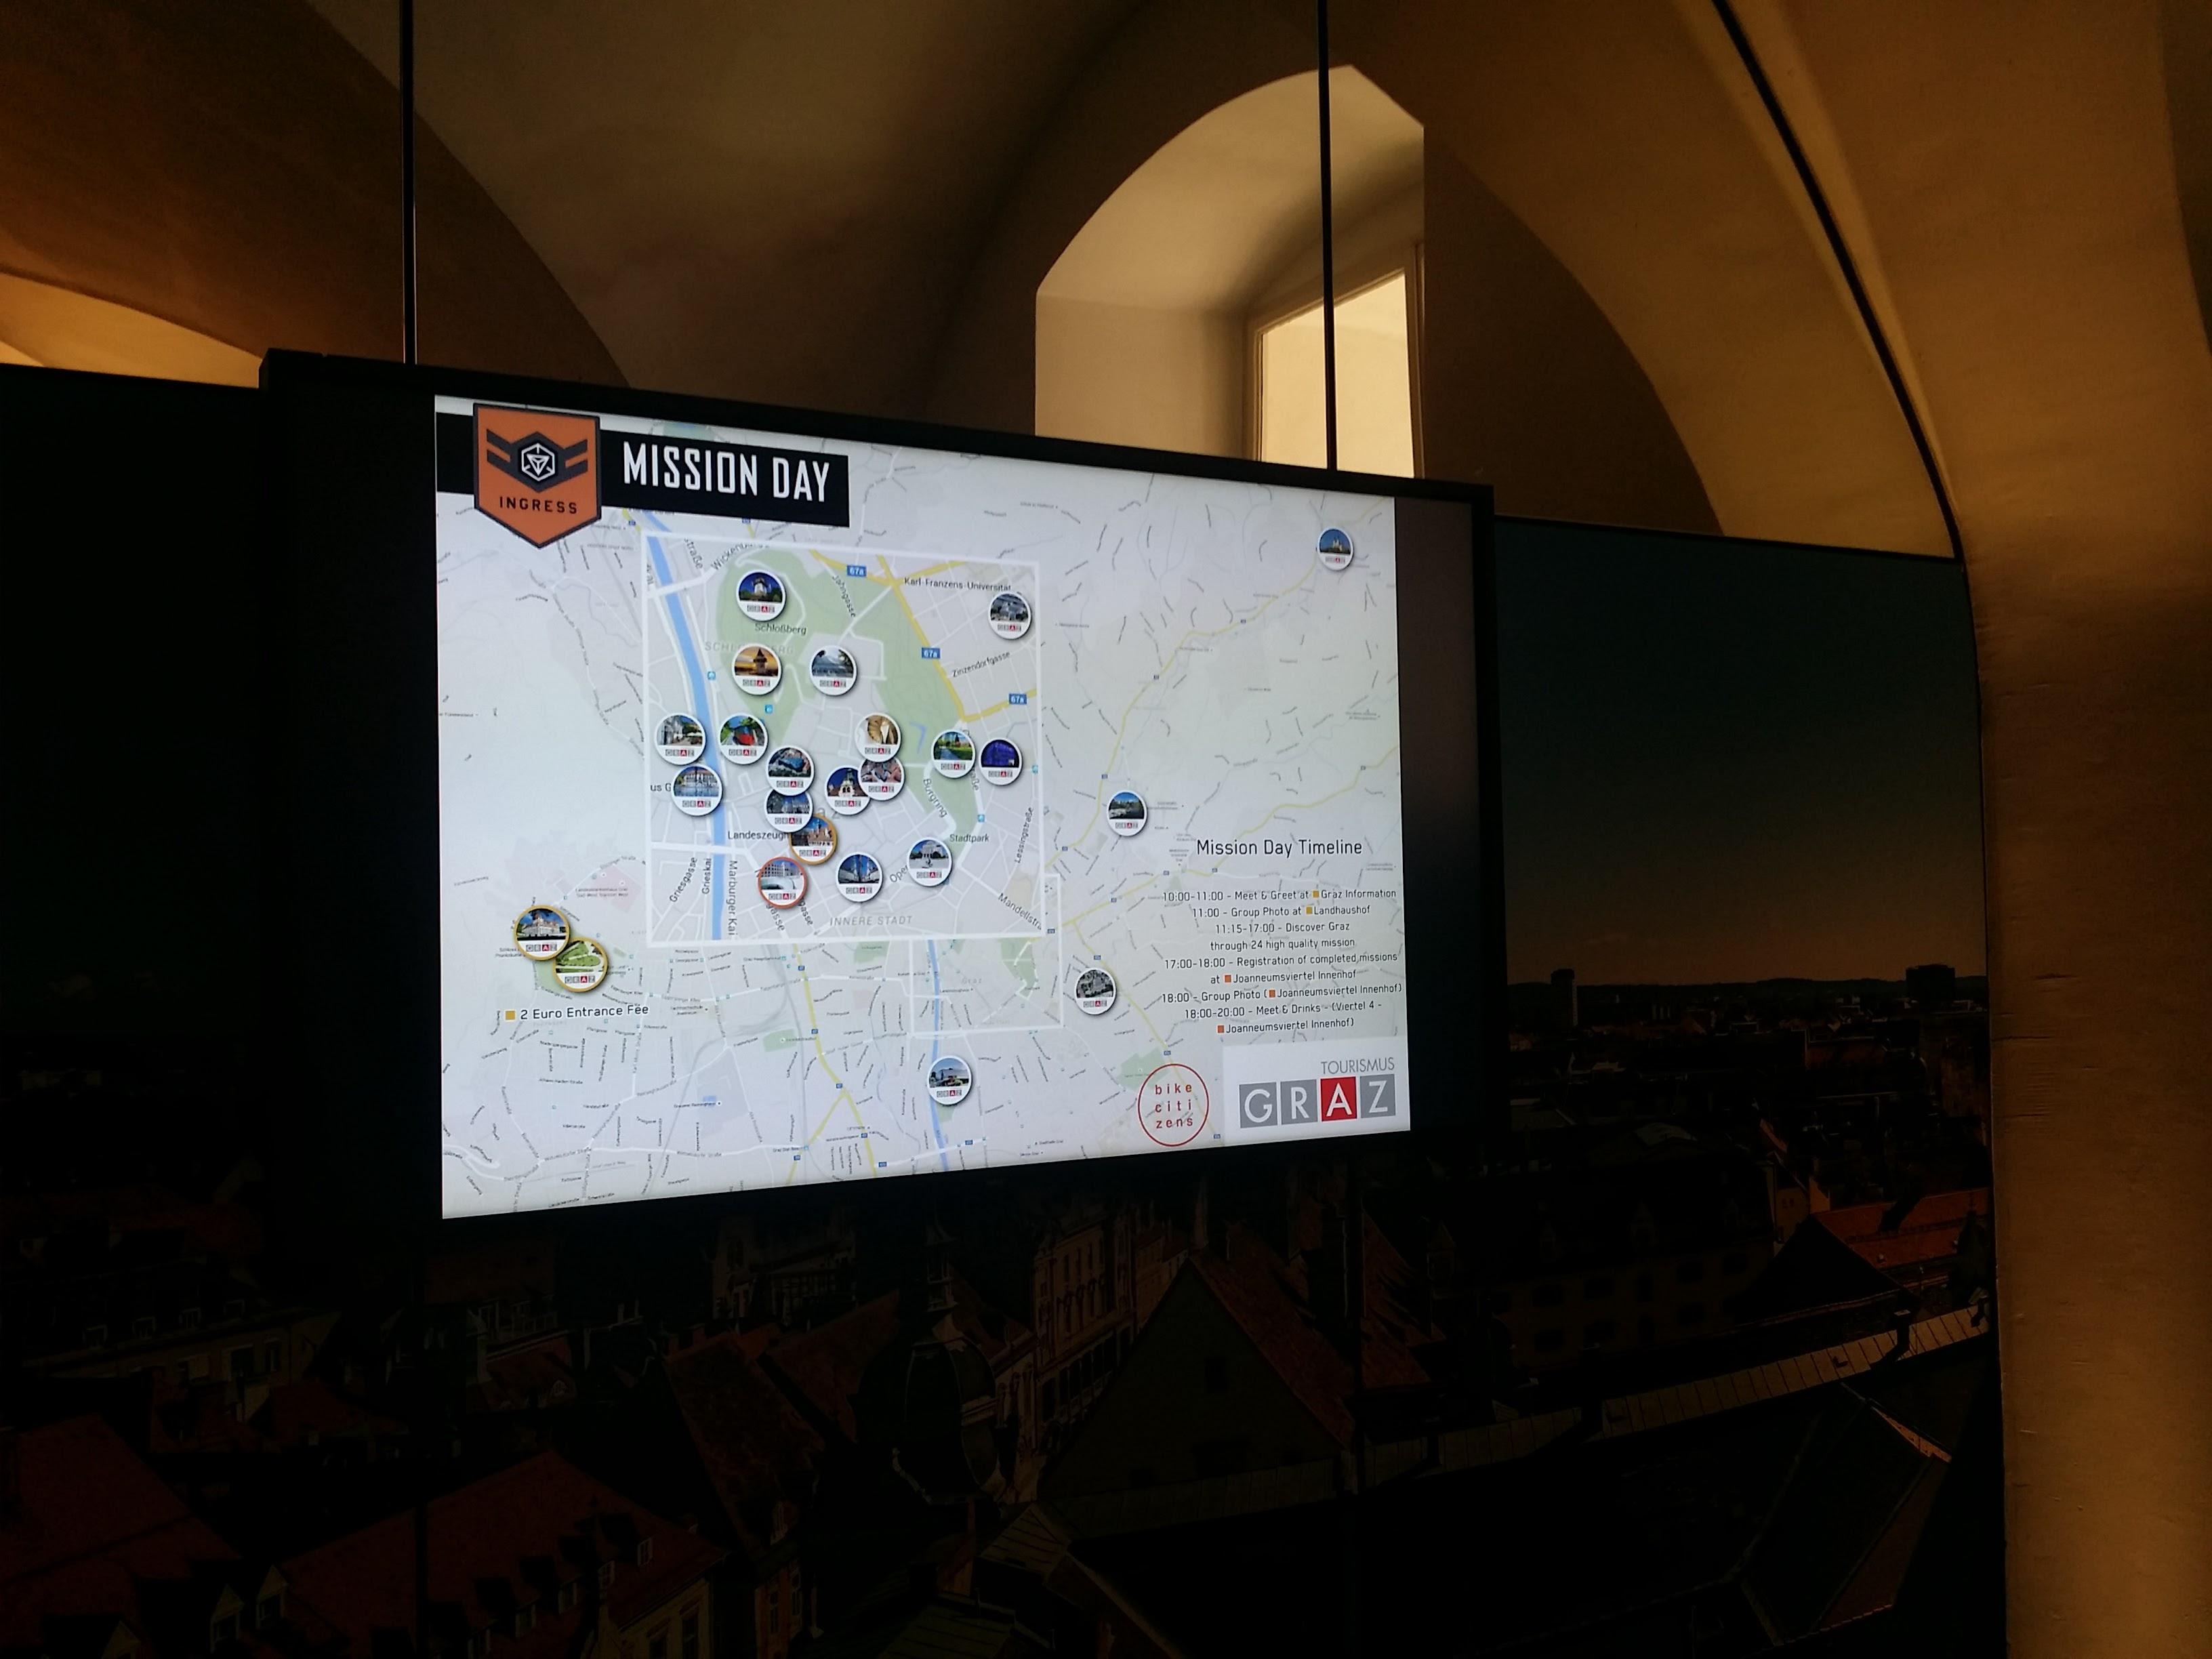 Mission Day Karte am Infoscreen - Foto: Stephan Lendl